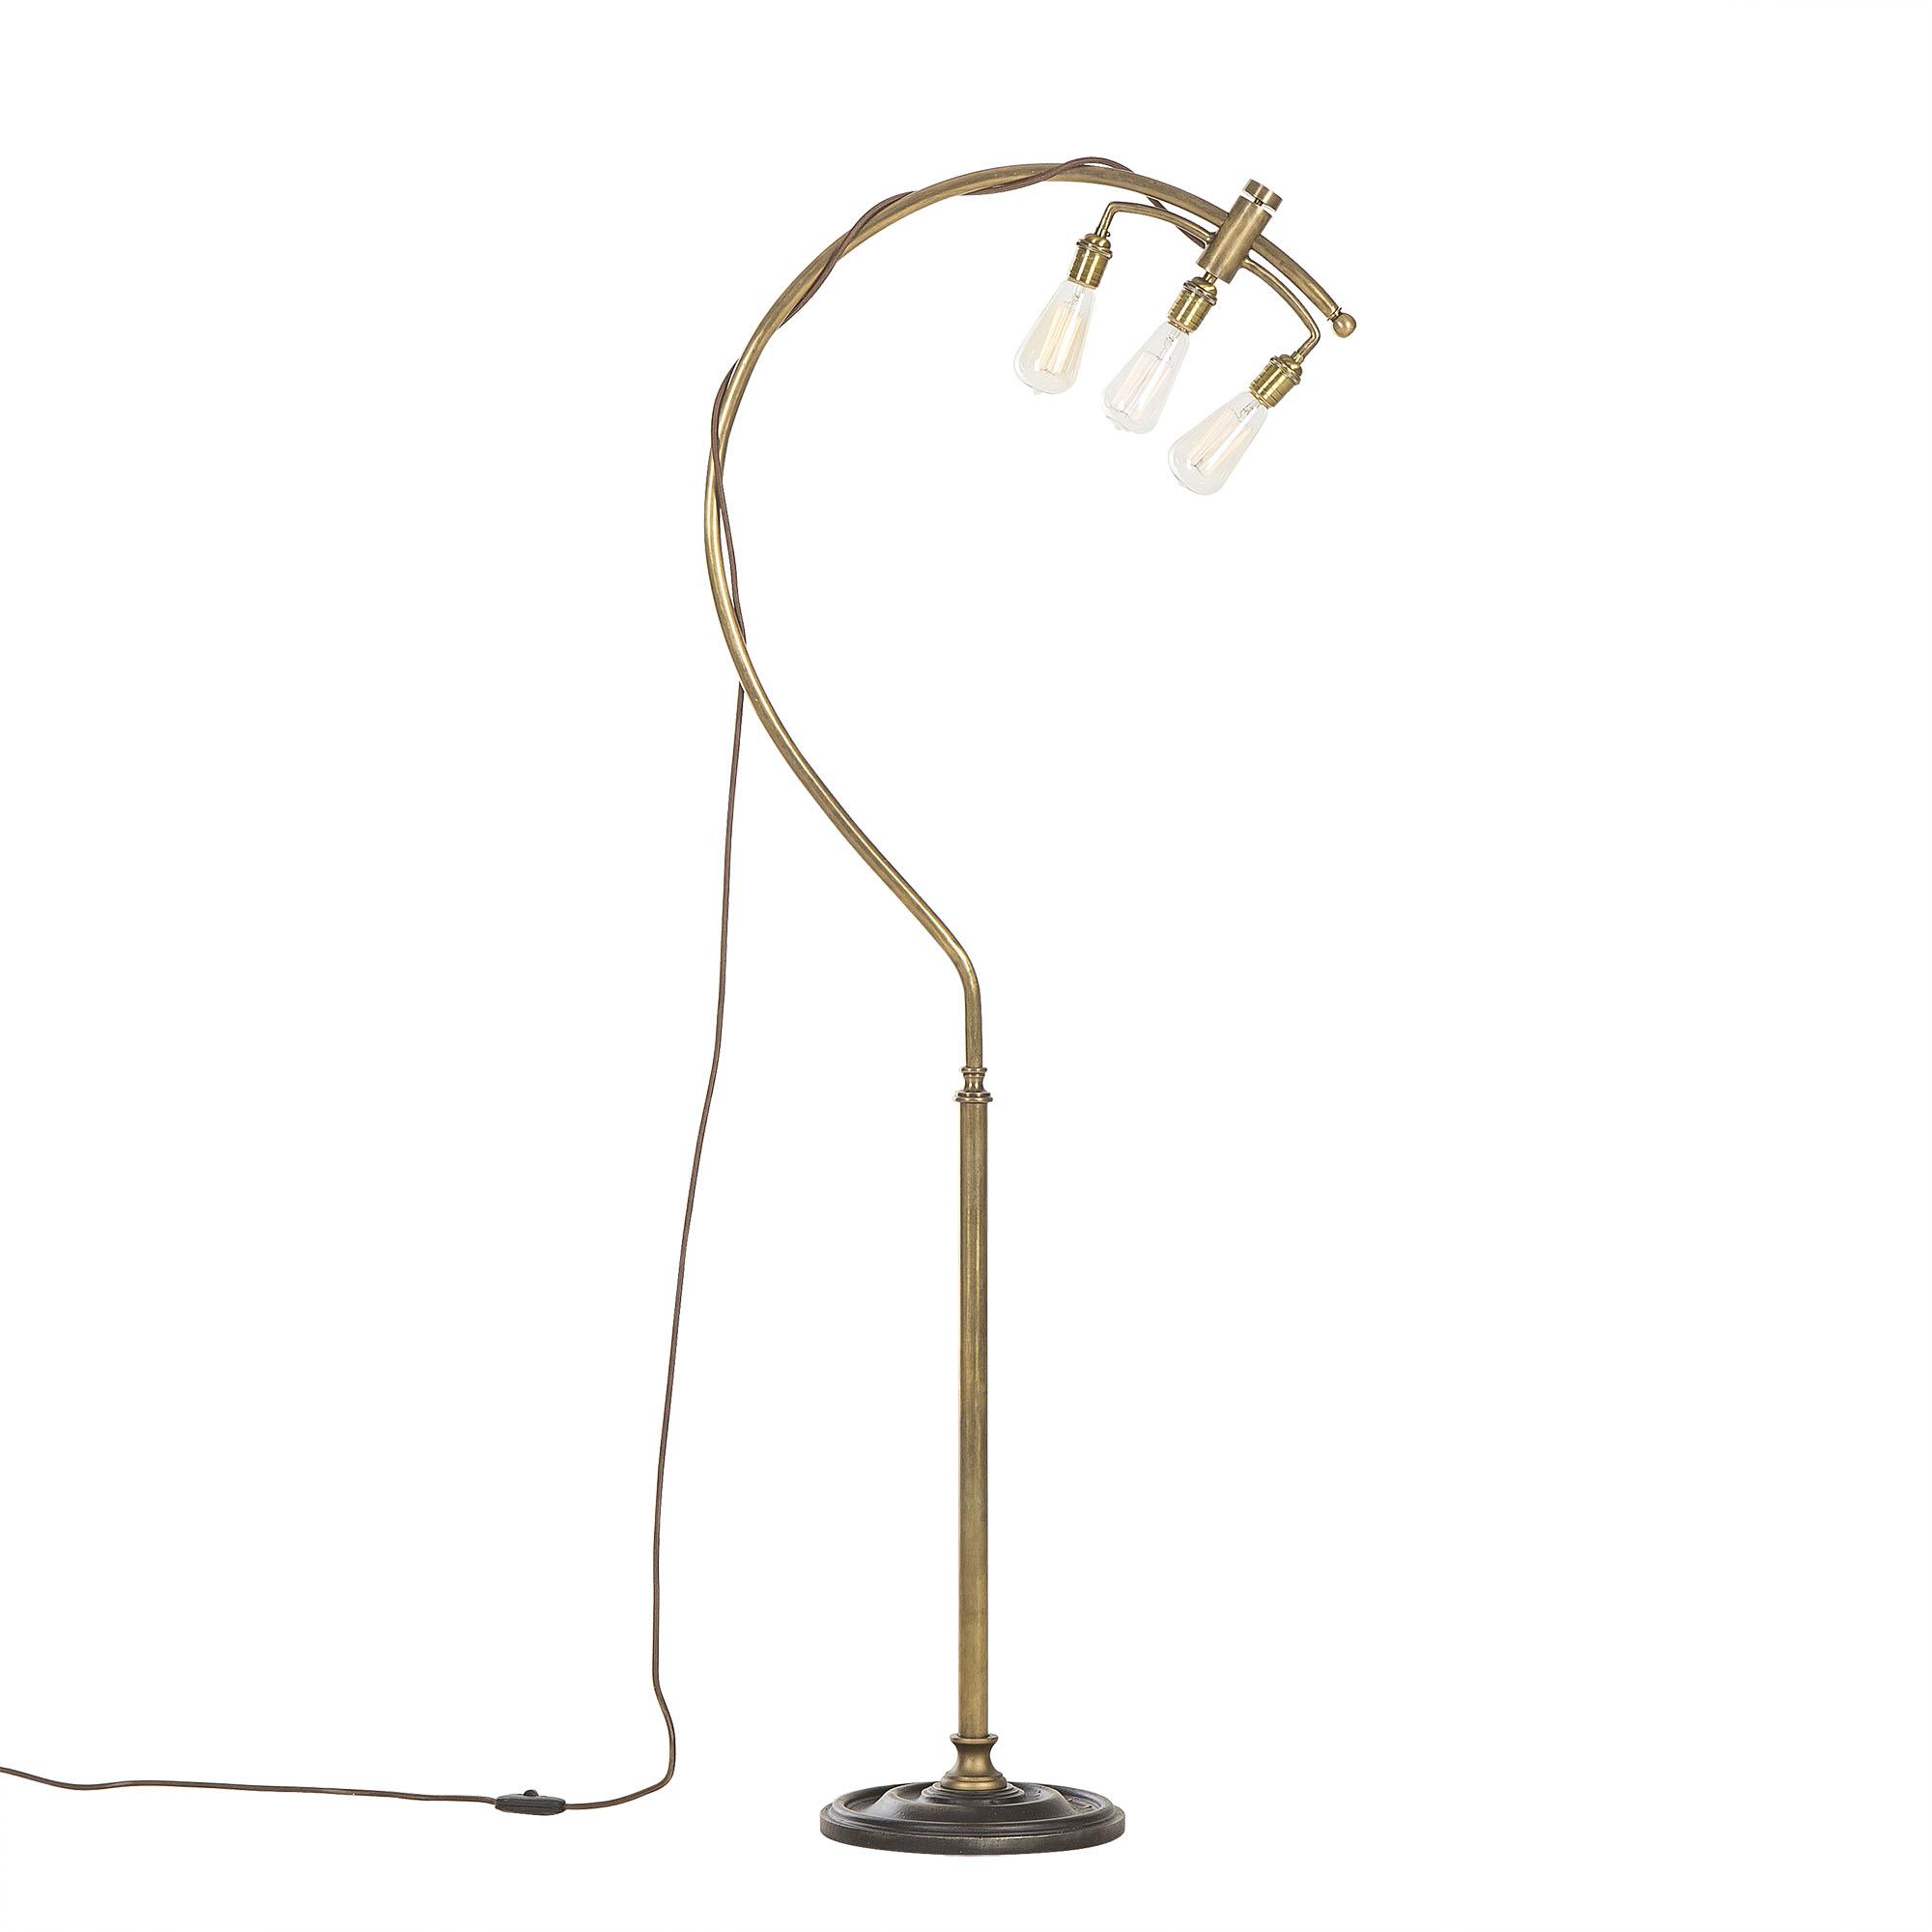 LI063F01 Cartogrpaher Floor Lamp.jpg